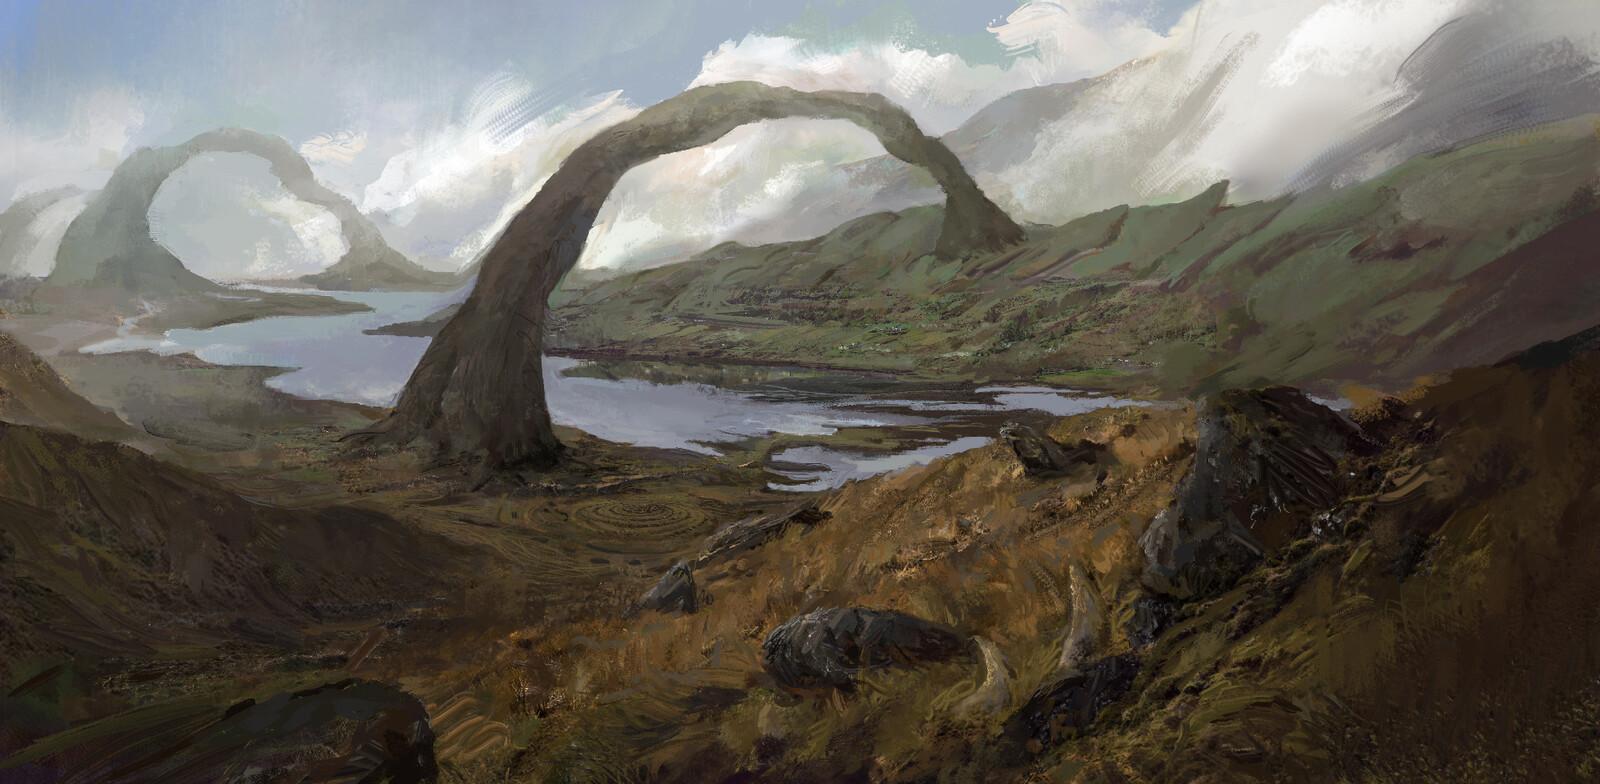 Wylfing lands